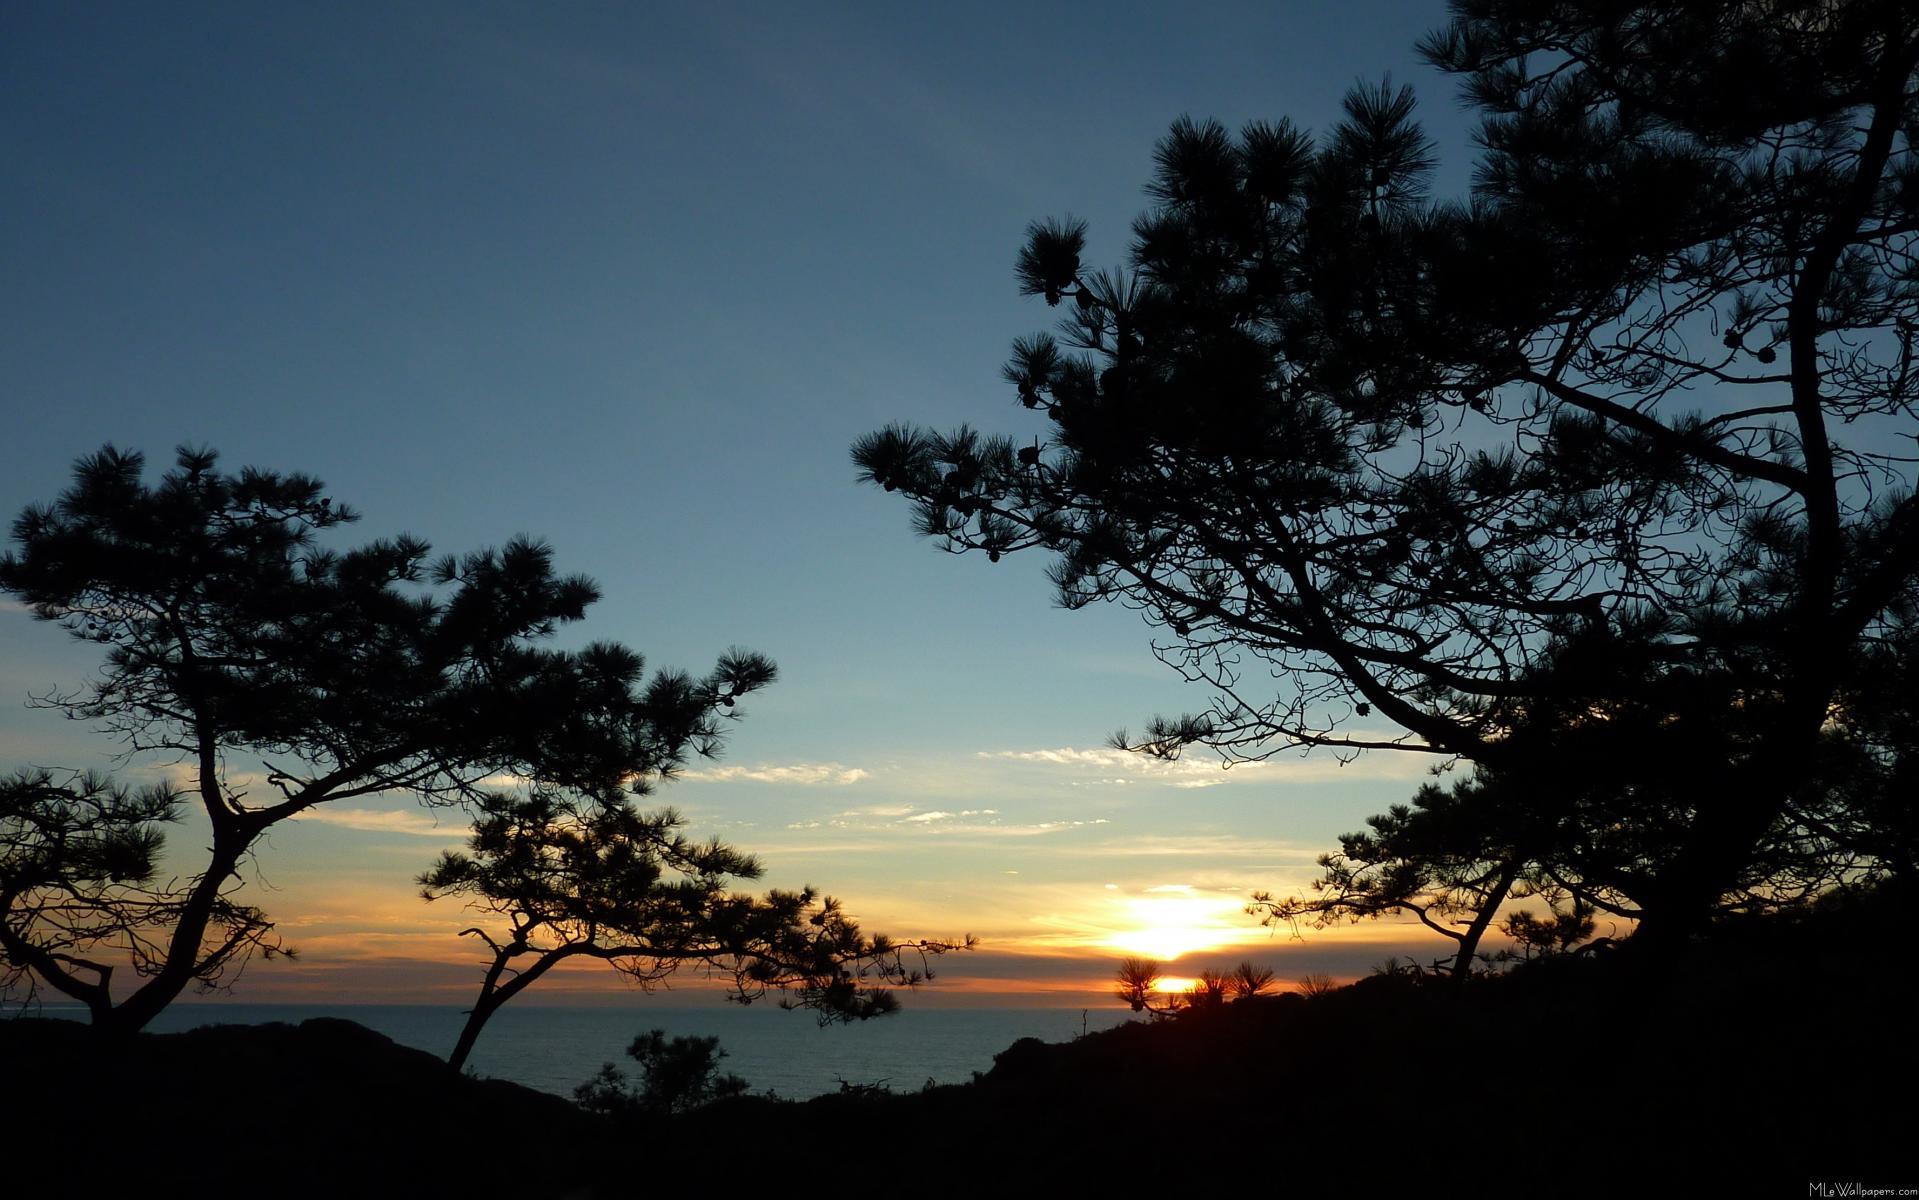 MLeWallpapers.com - Torrey Pine Sunset III